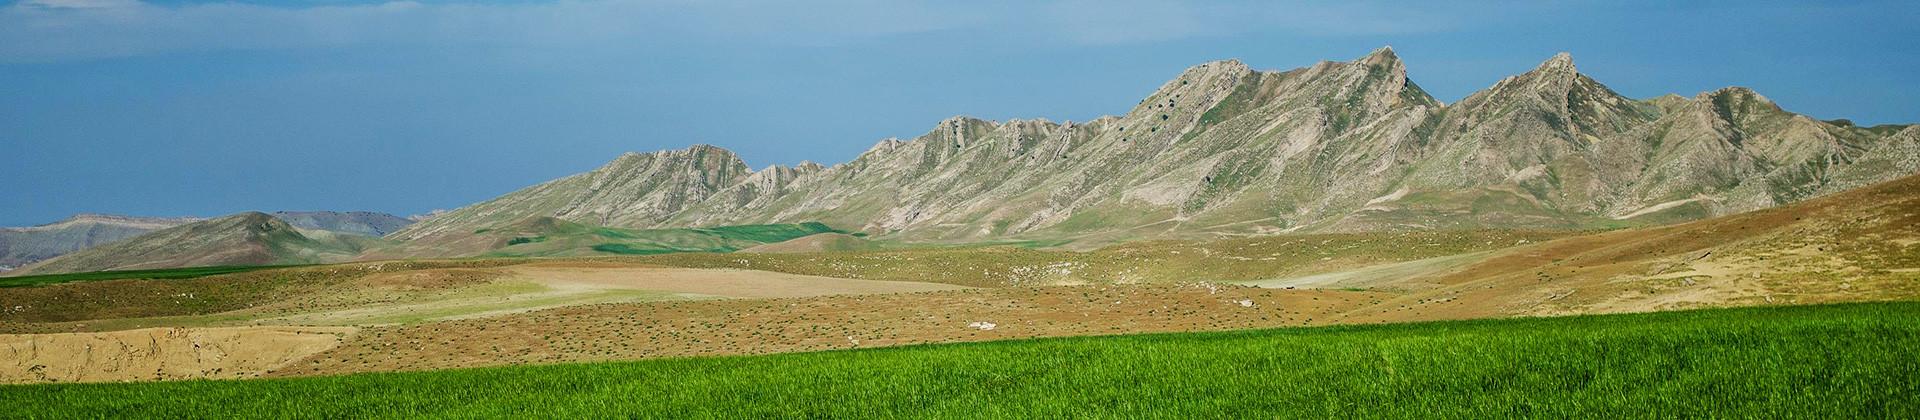 Mountains of Gazalkent (Economy) - 1